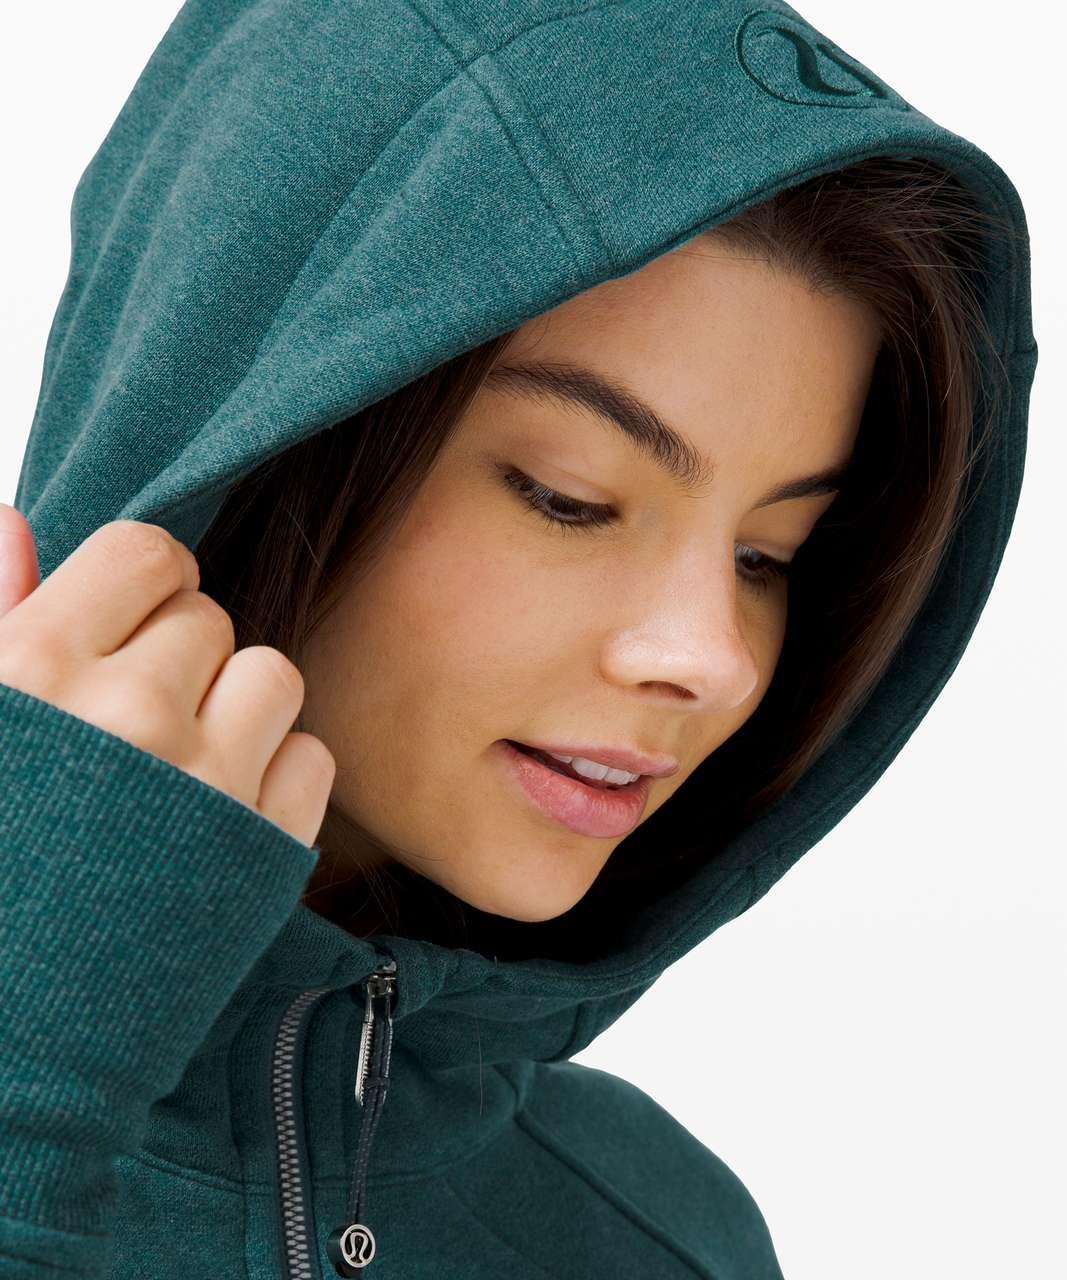 Lululemon Scuba Hoodie *Light Cotton Fleece - Heathered Desert Teal